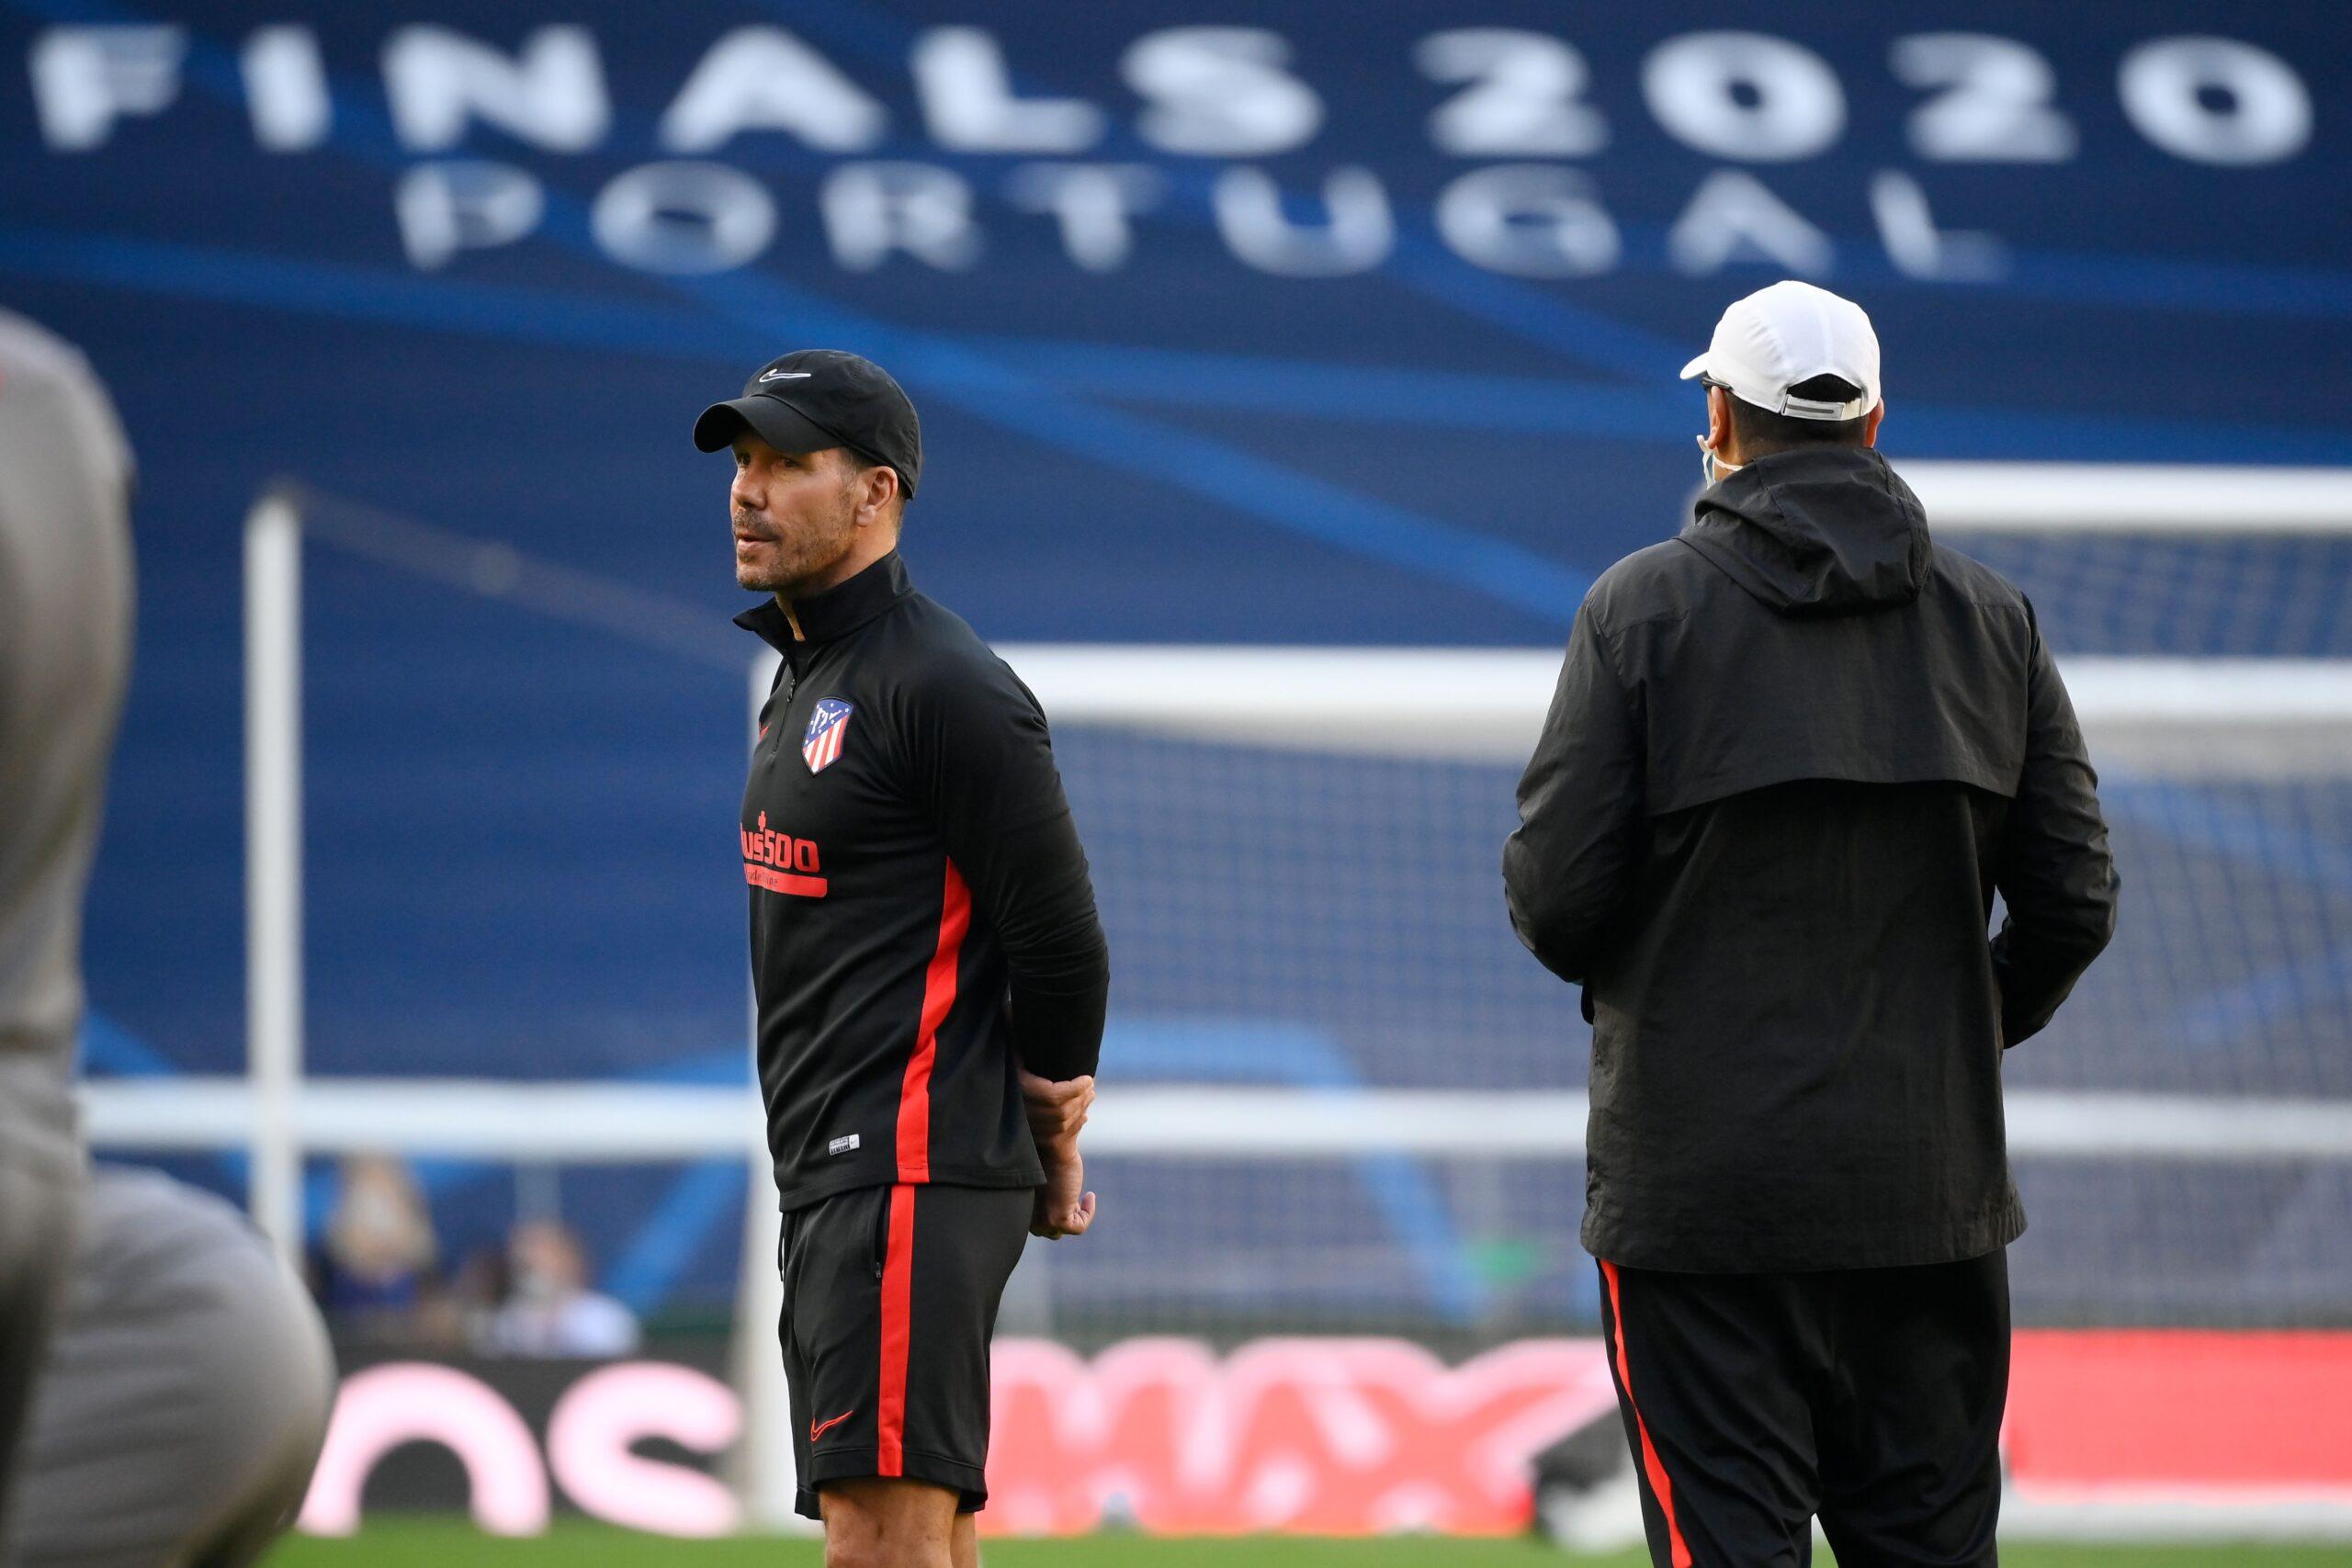 Fichajes: Hoy miércoles llega a Madrid y firmará con Simeone